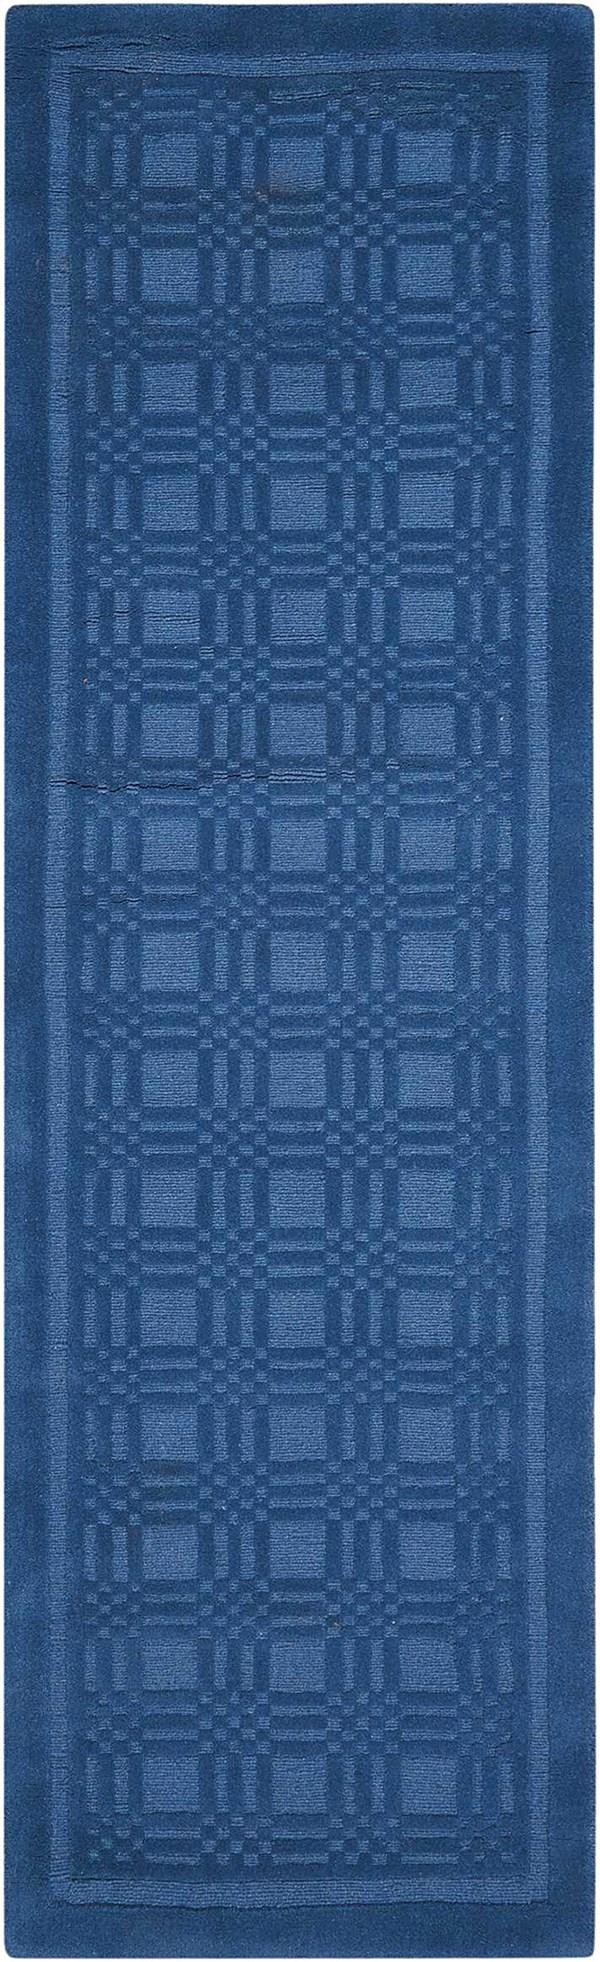 Blue Transitional Area Rug